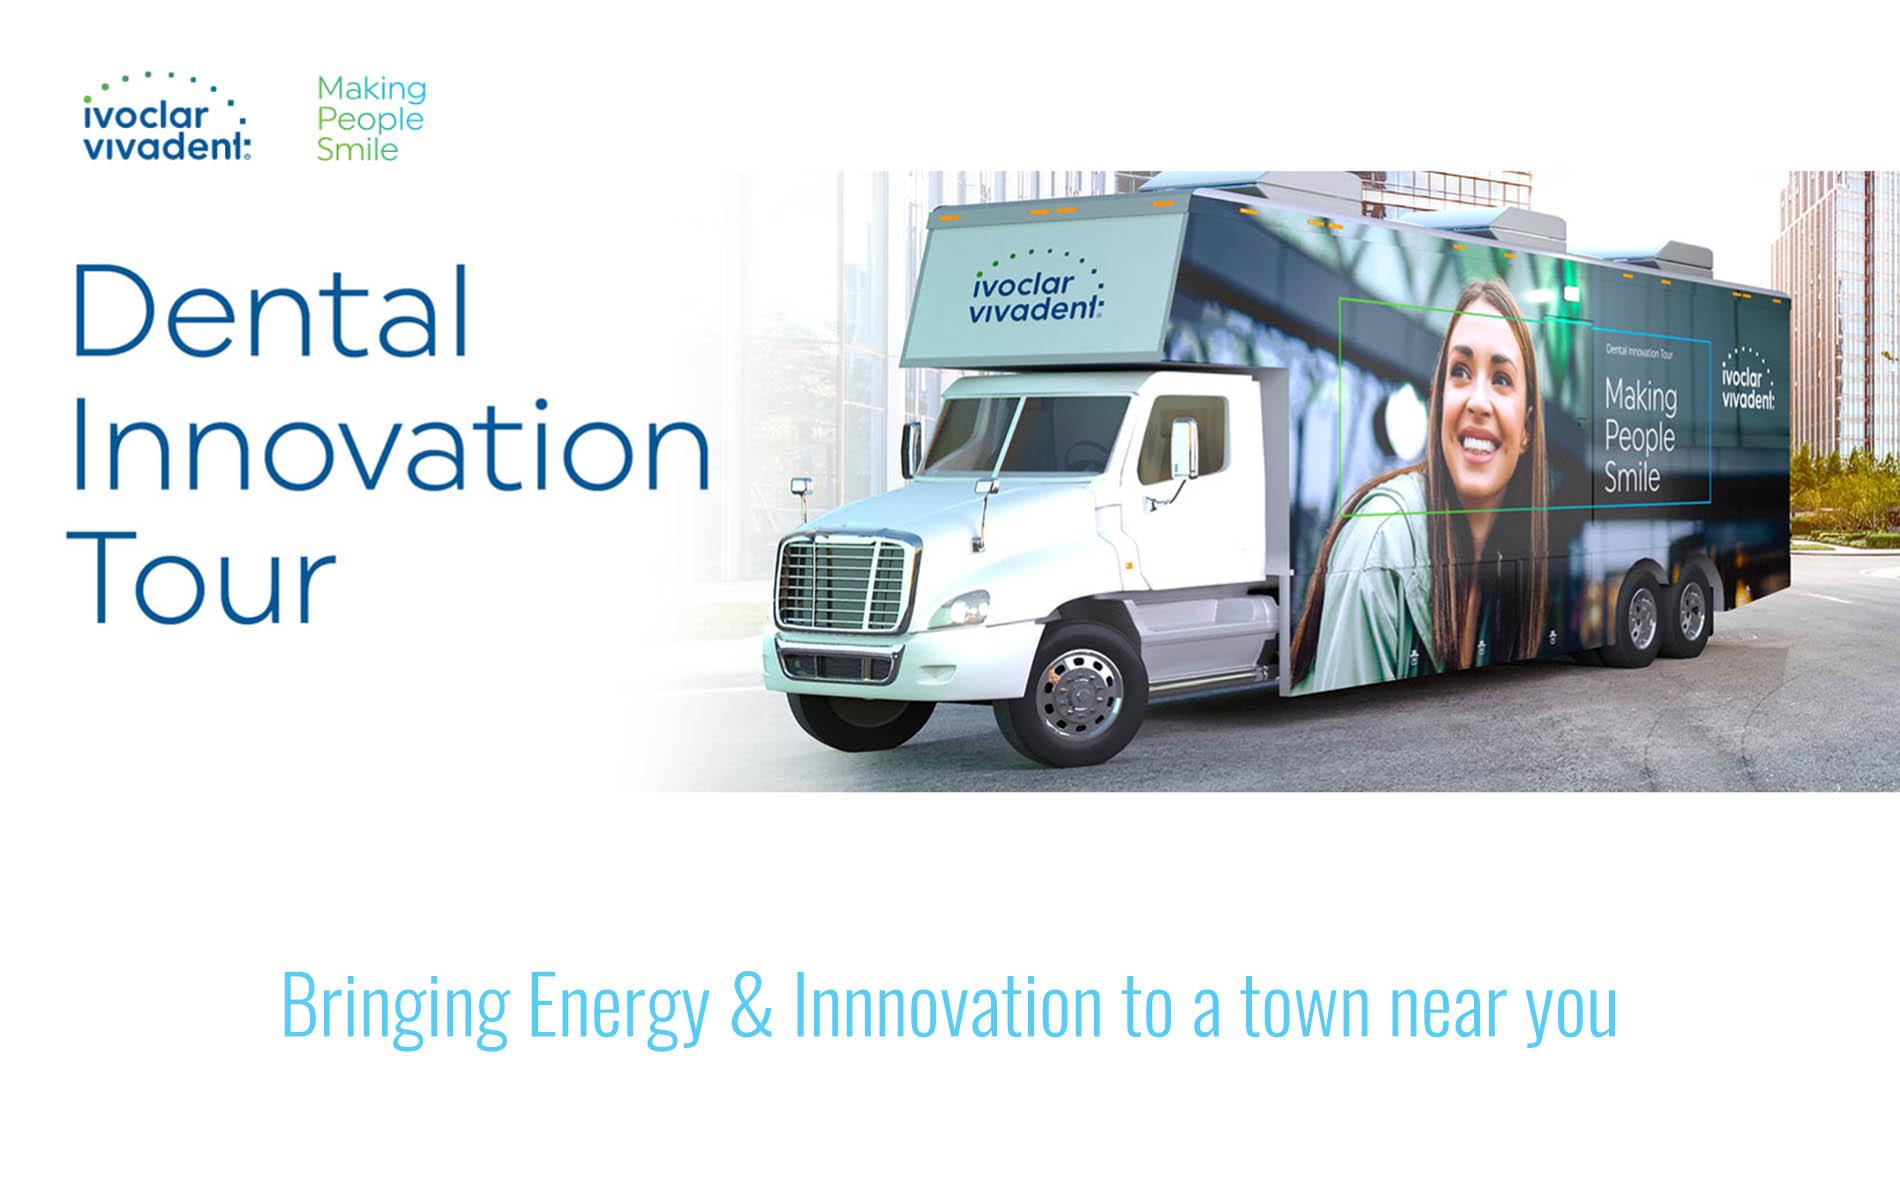 Ivoclar Vivadent's 2021 Dental Innovation Tour